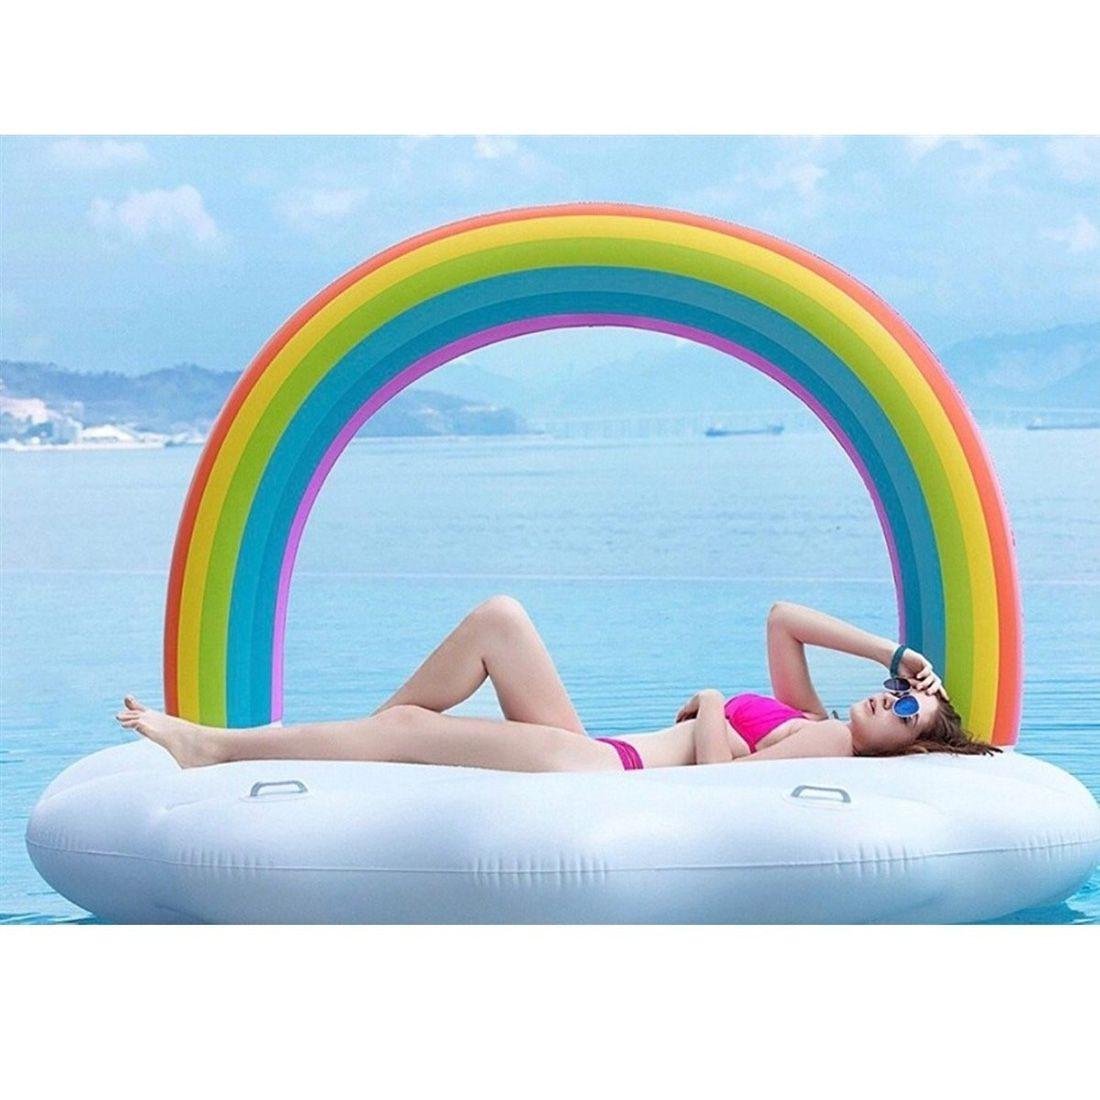 Boia Arco Iris Inflavel Gigante Flutuante 2 Metros Piscina Praia Festa Lazer 4 Pessoas